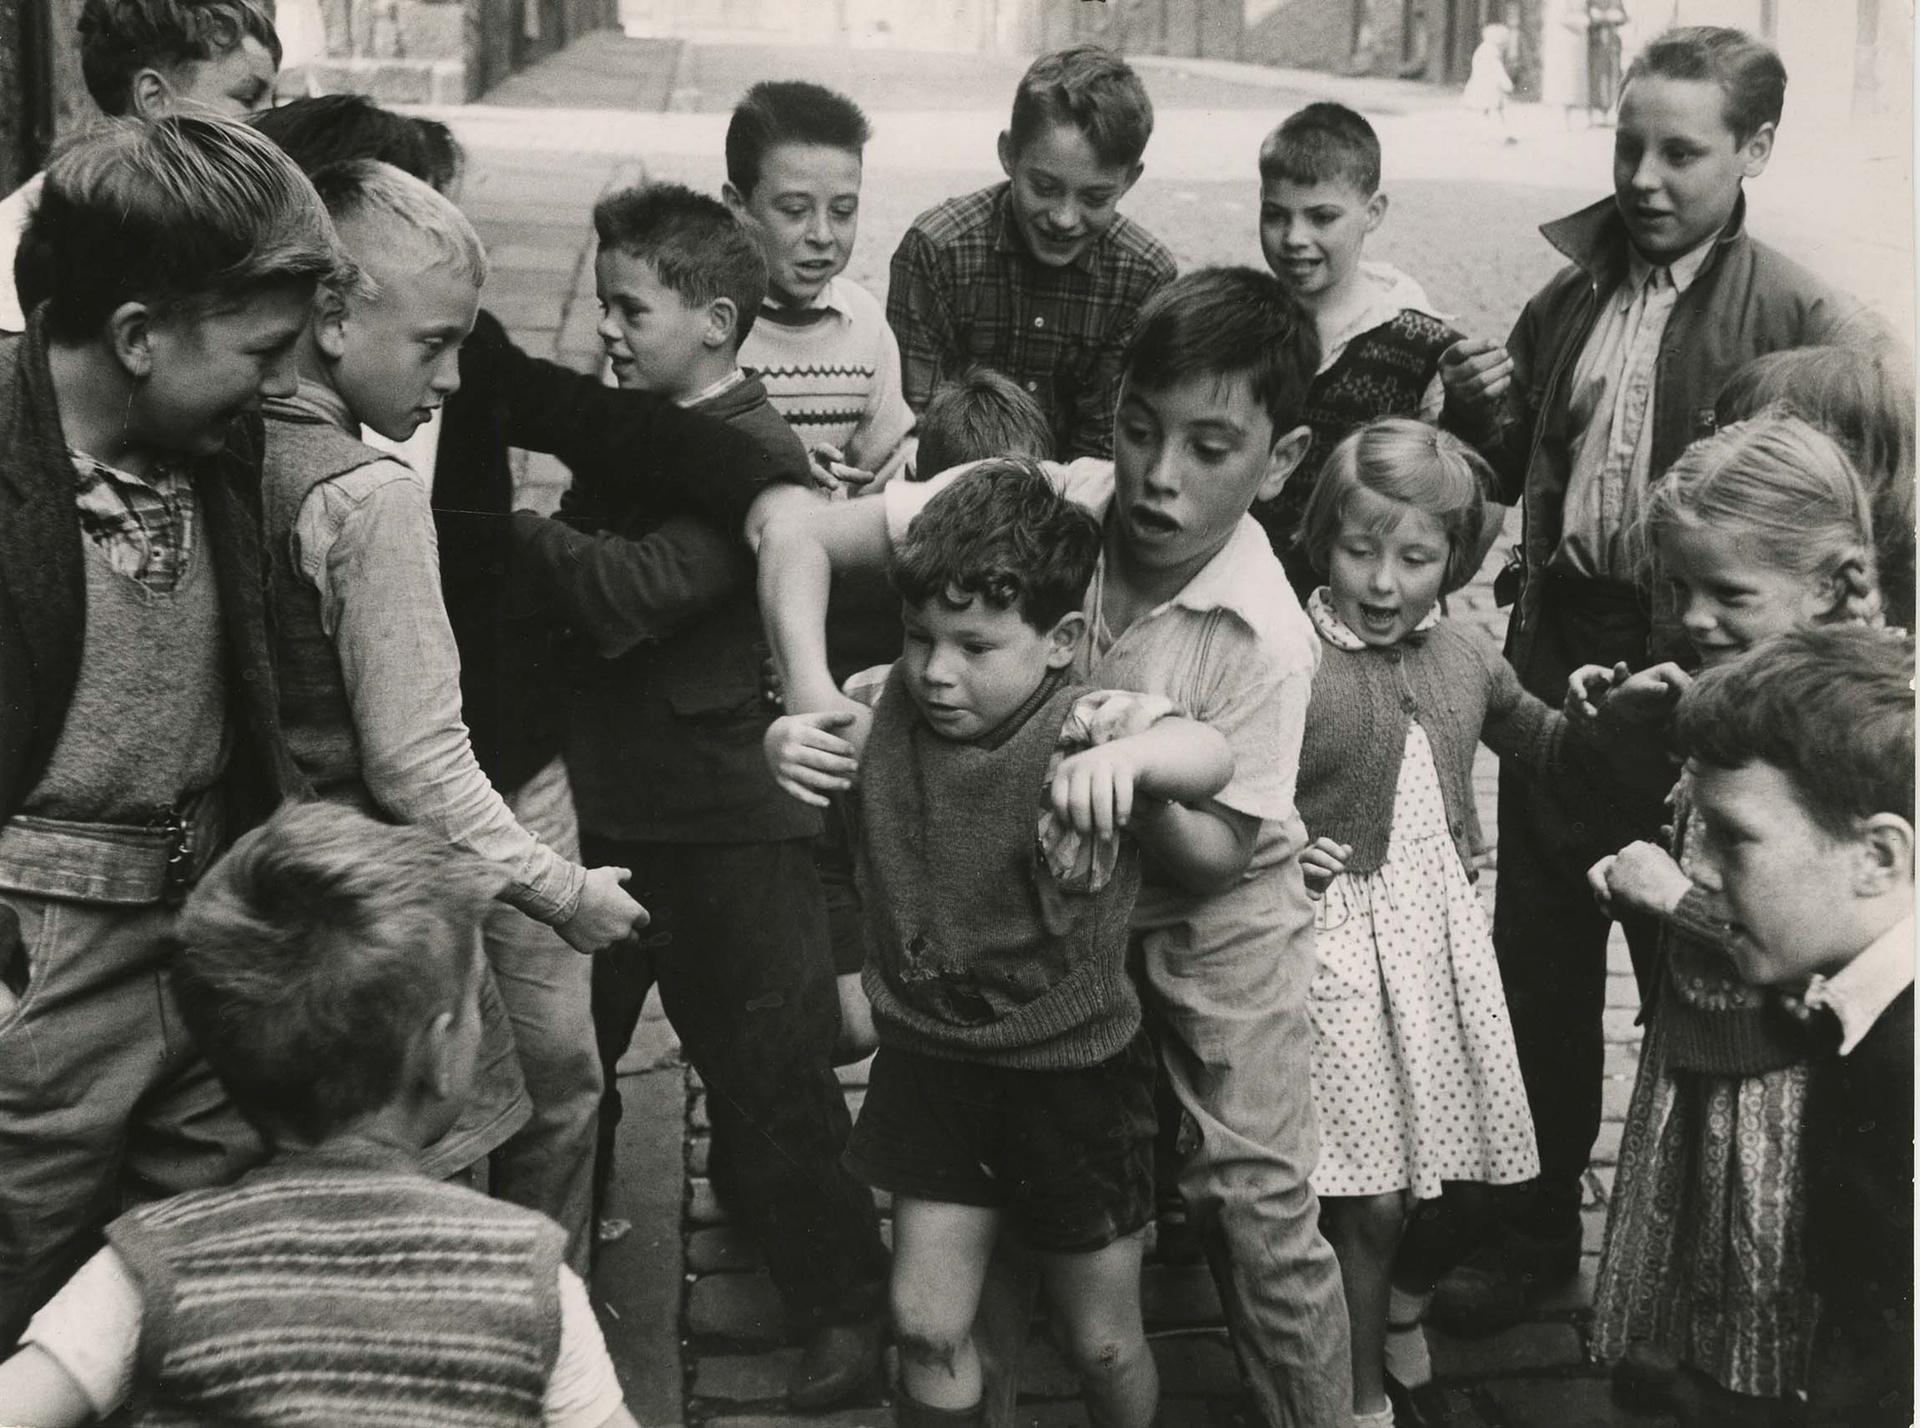 1958. Эдинбург. Драка